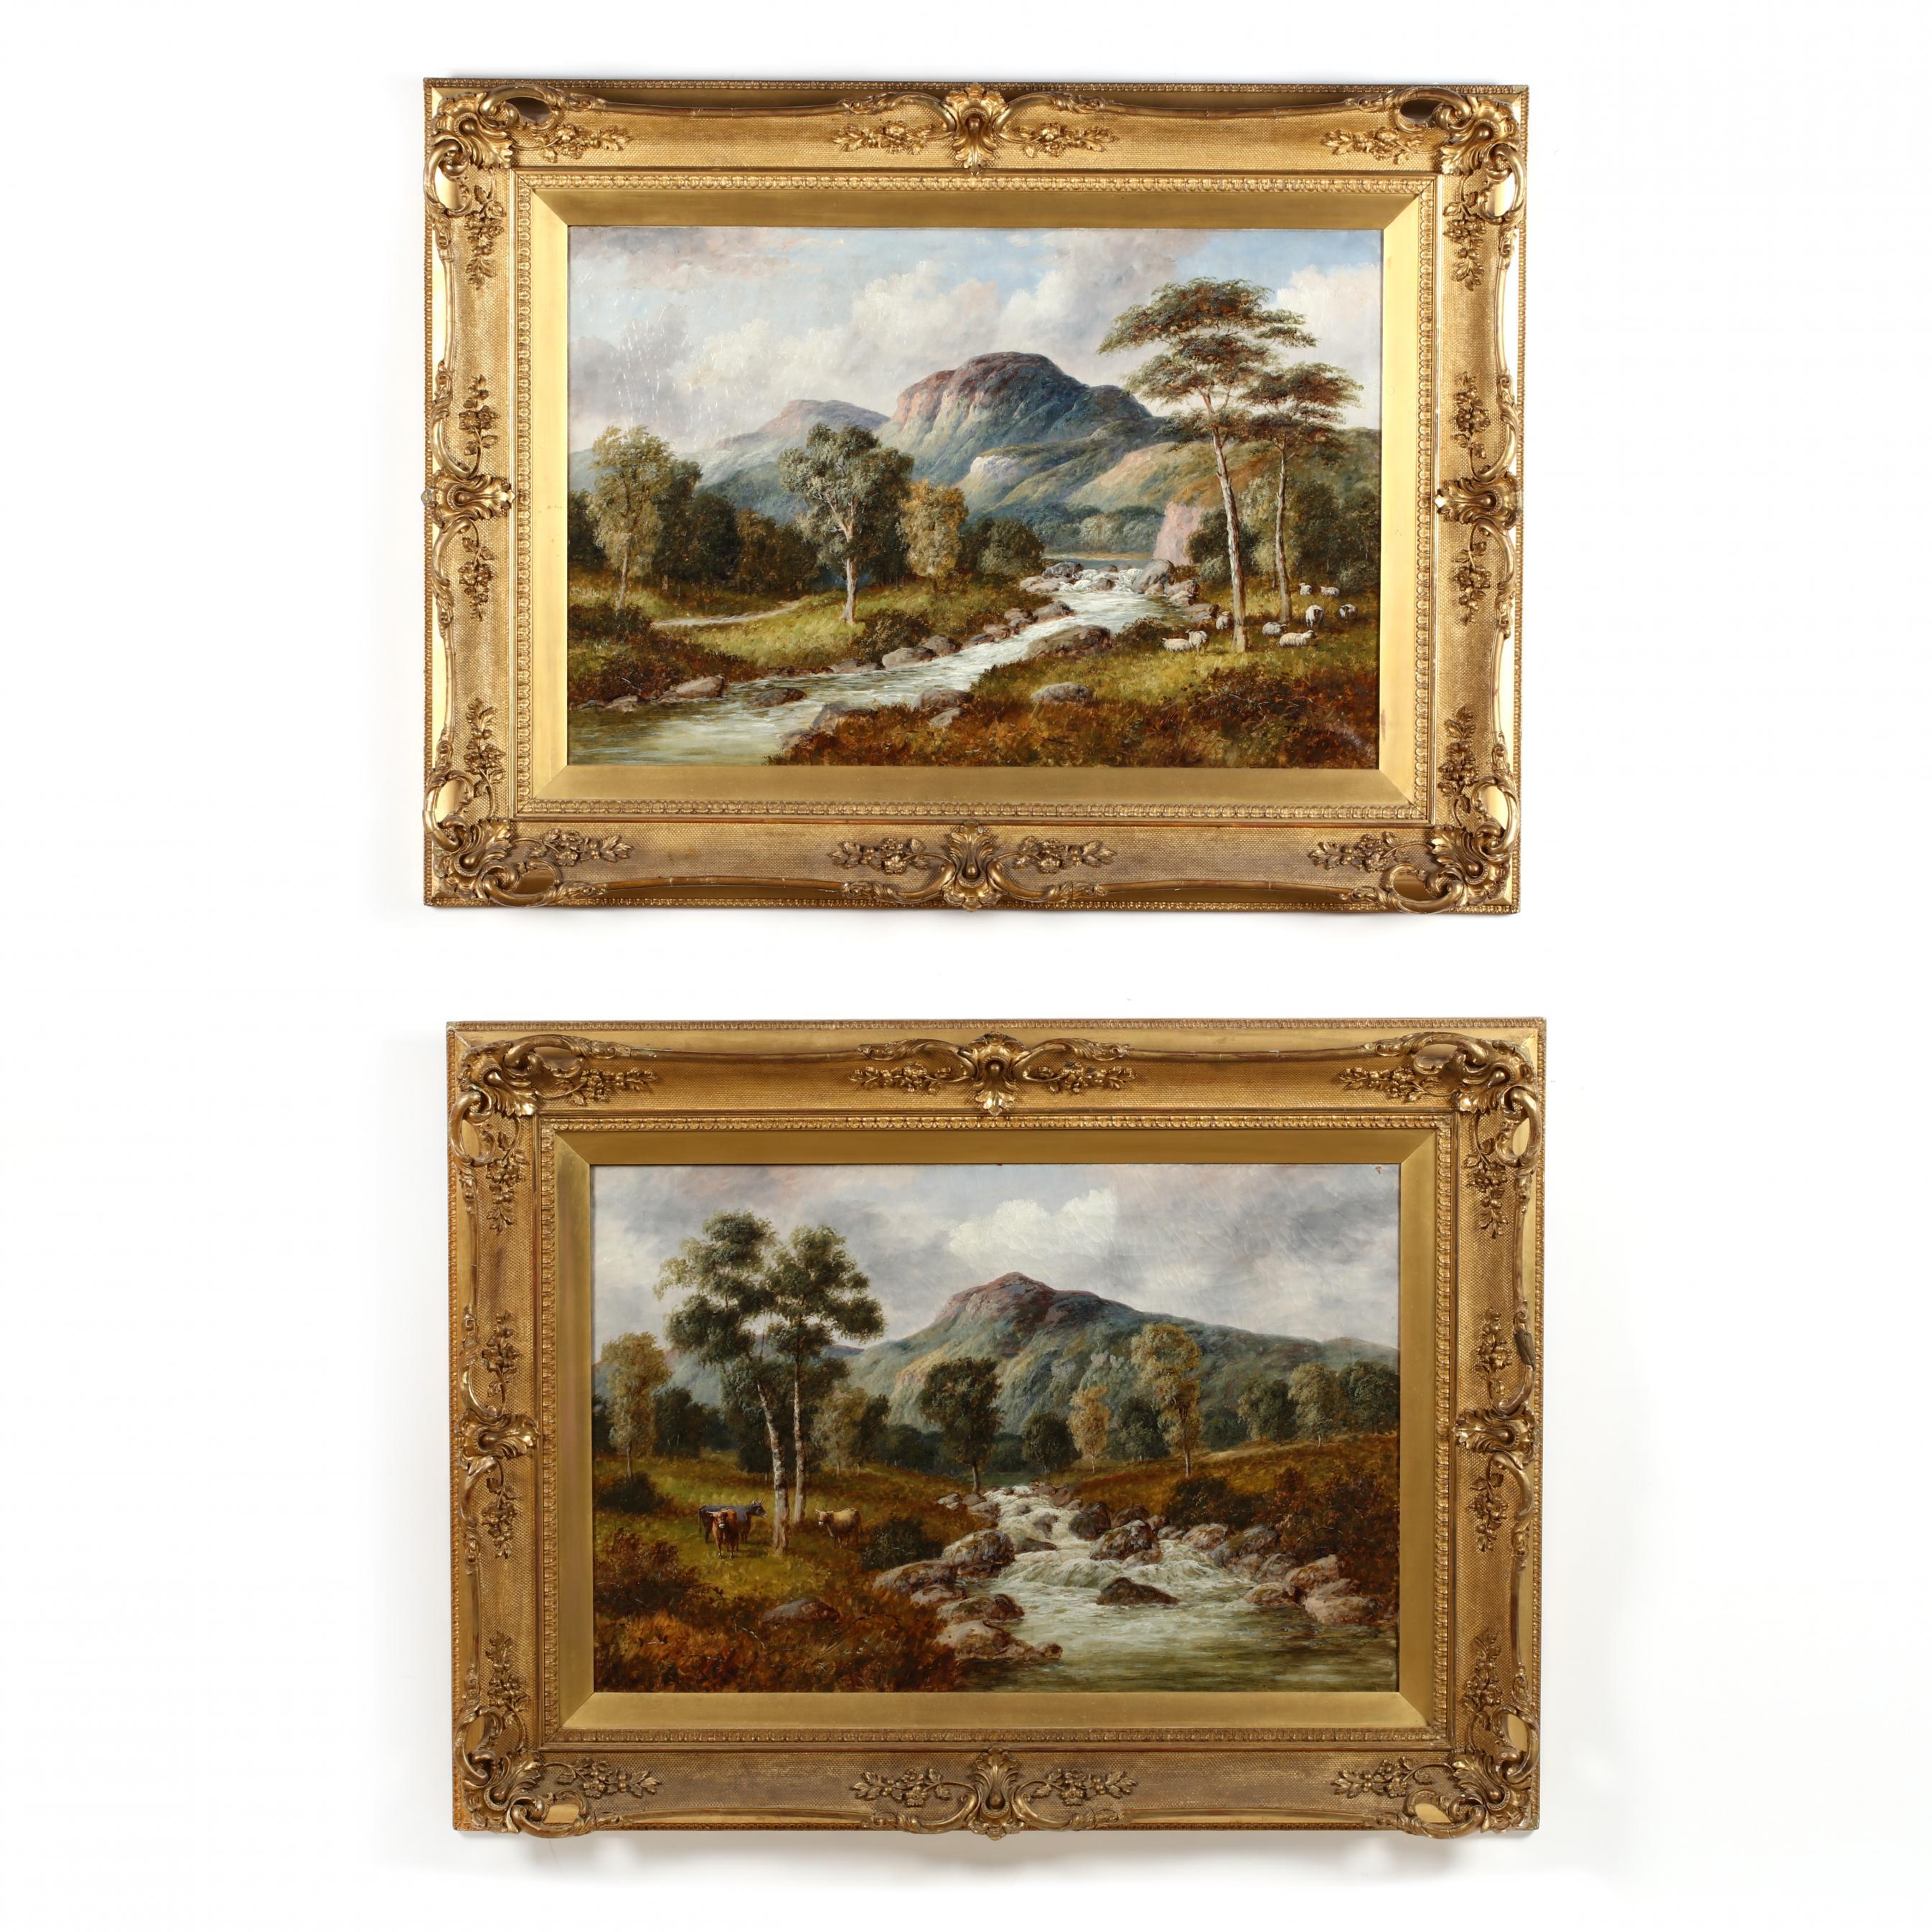 maude-goodman-british-1860-1938-pair-of-landscapes